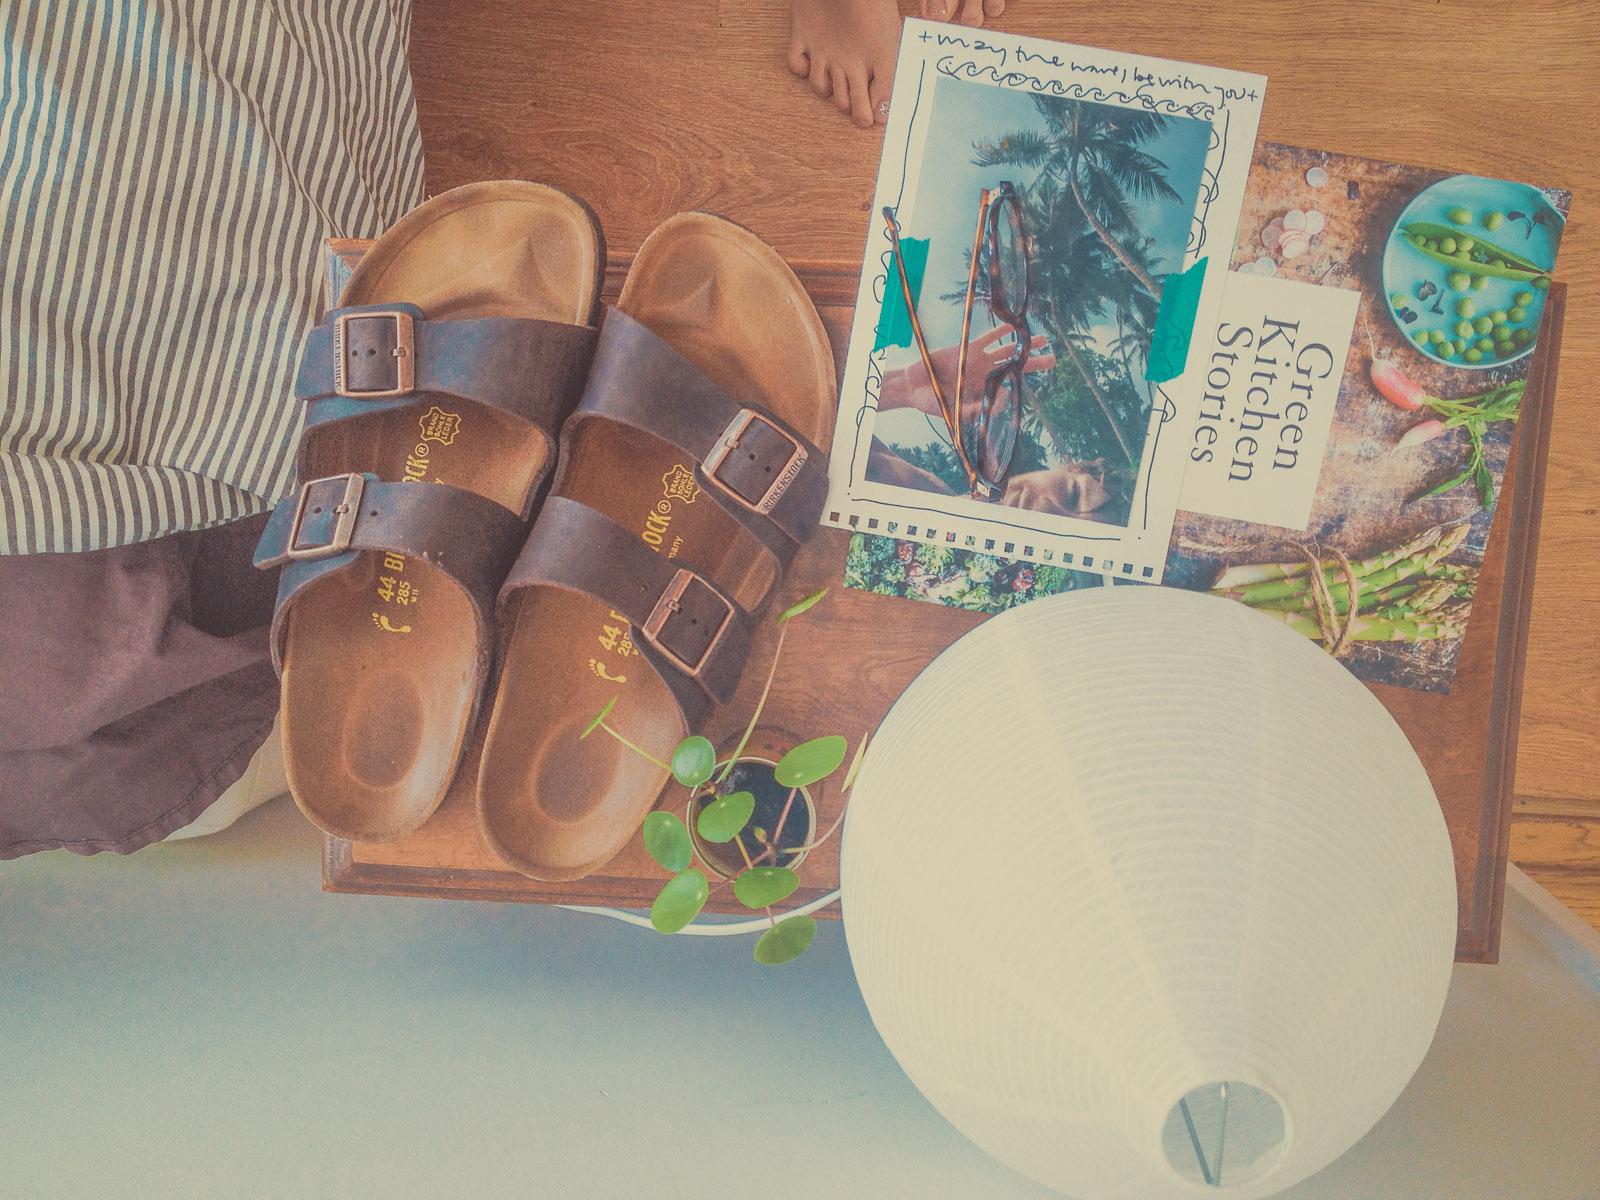 Sunshinestories-surf-travel-blog-IMG_5723